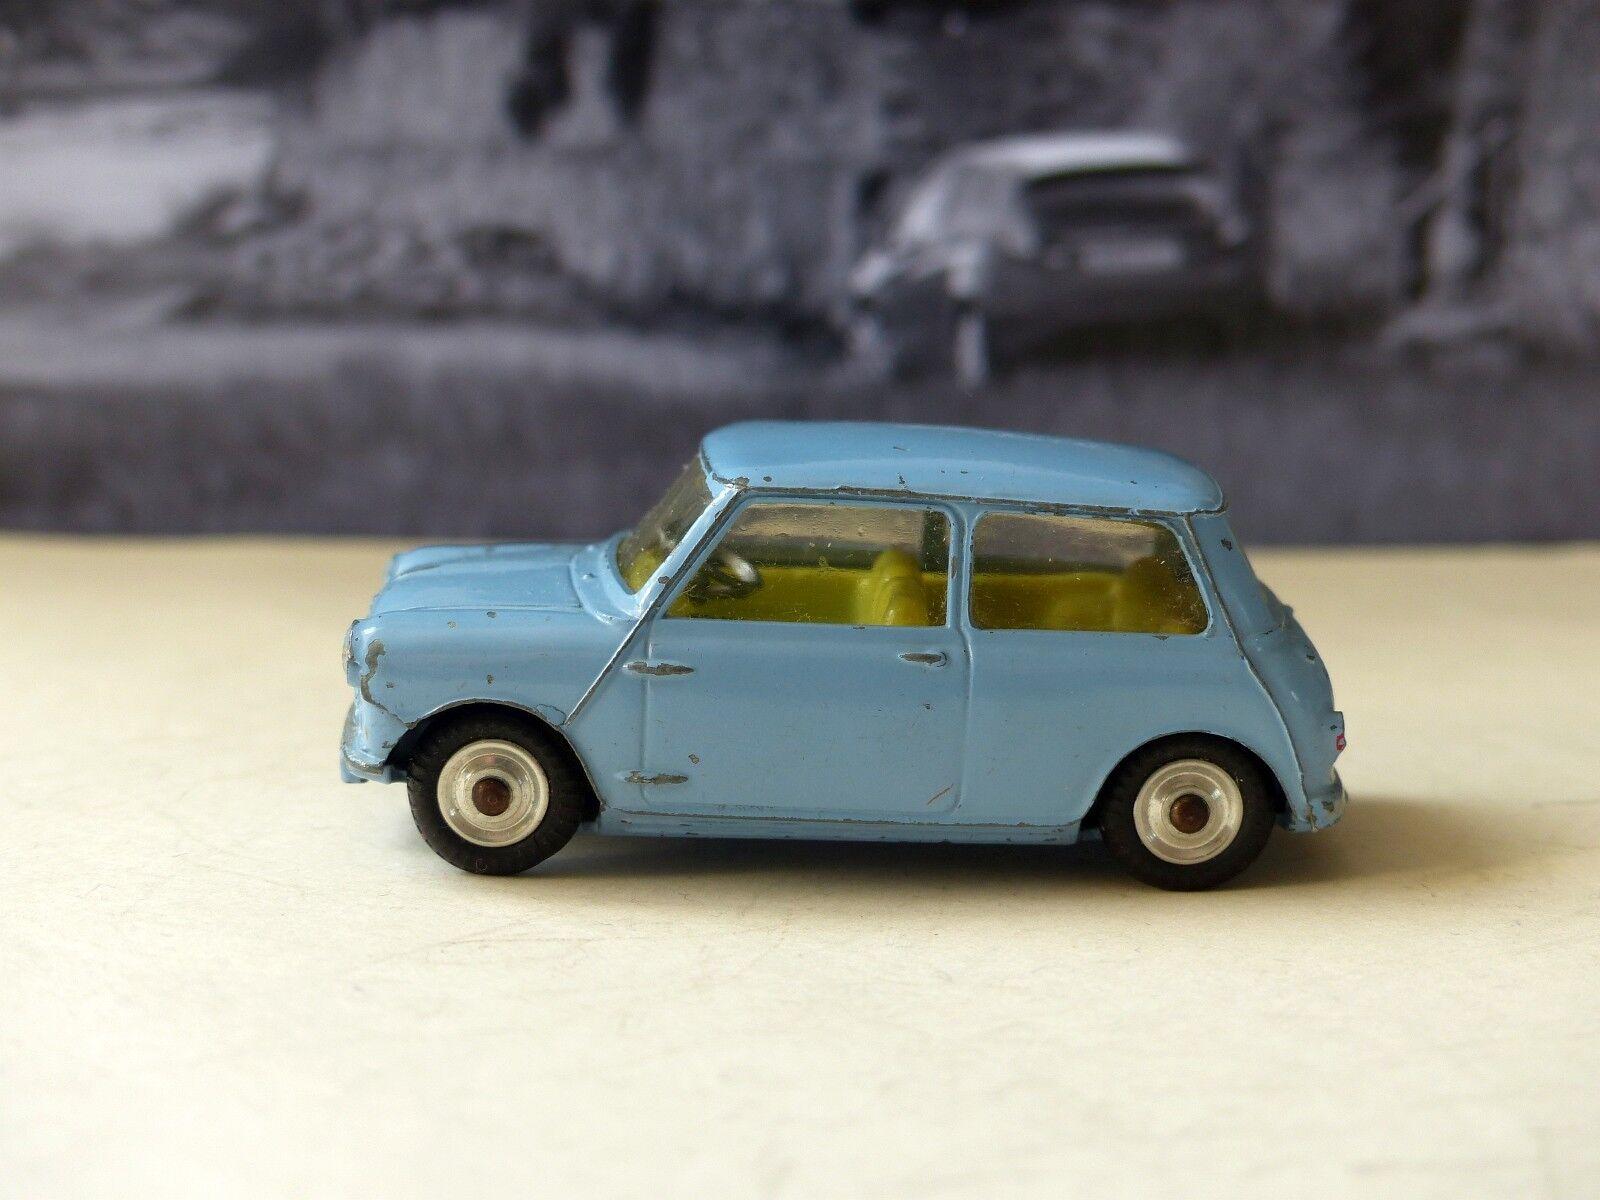 CORGI TOYS 226 Morris Mini Minor bleu pâle avec intérieur citron